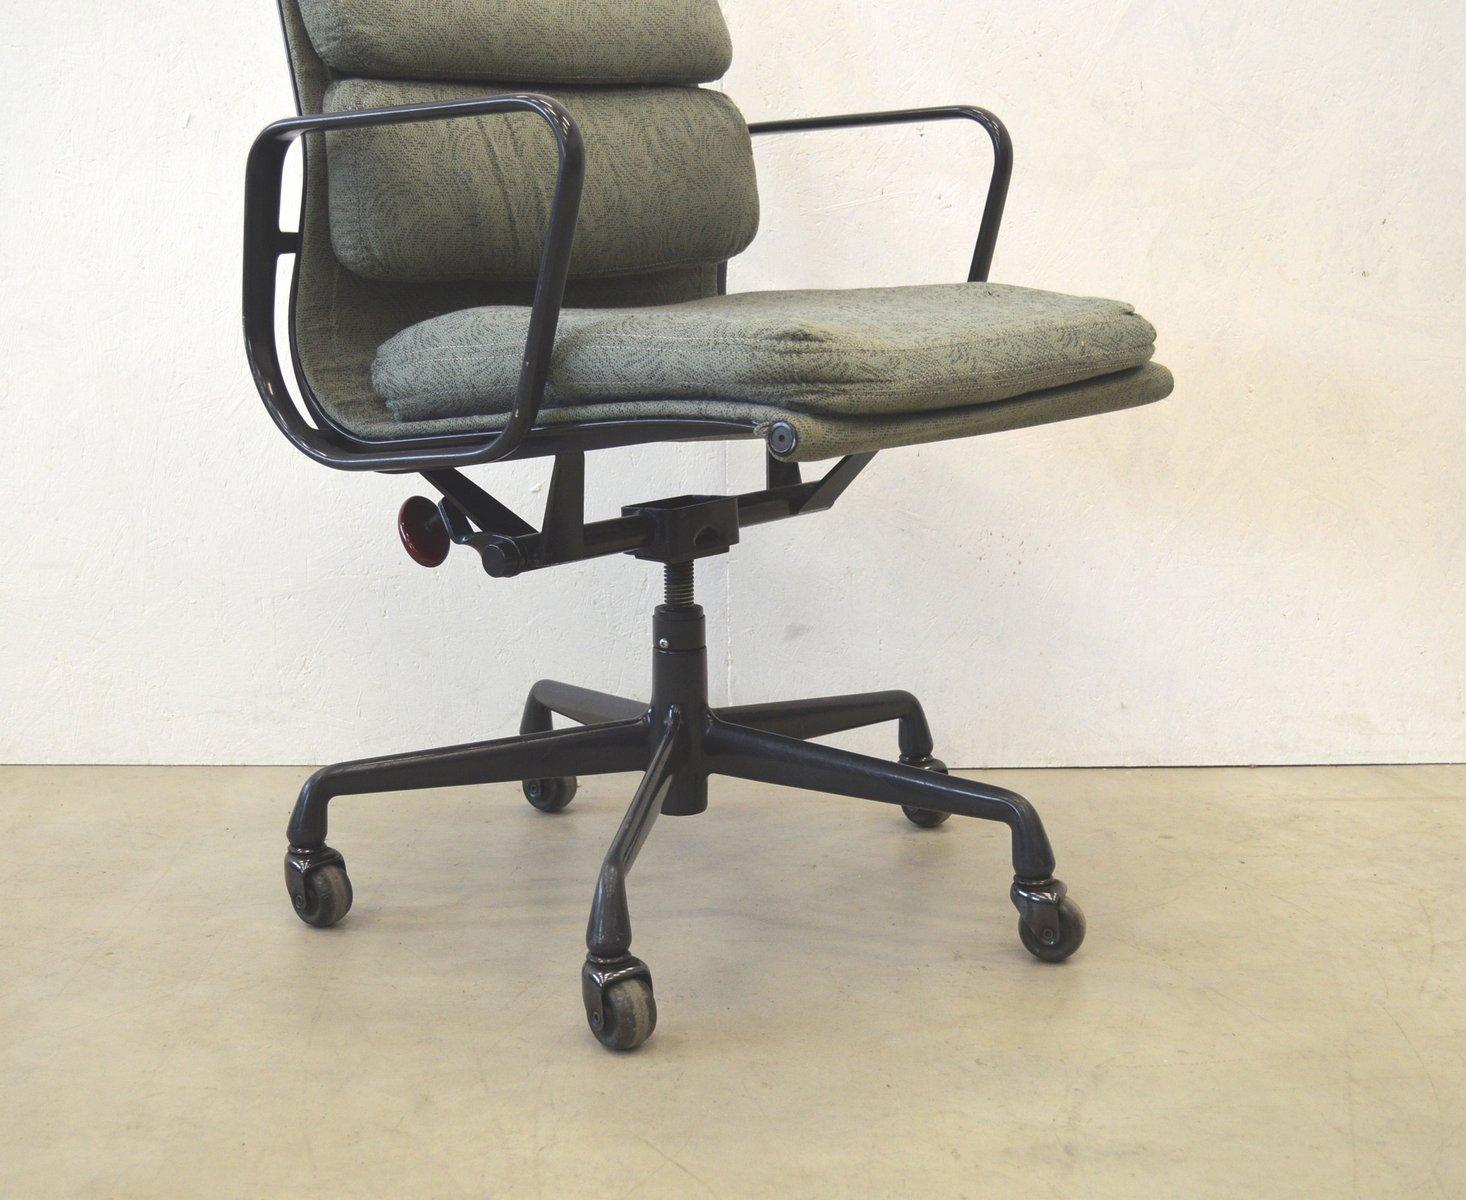 amerikanischer ea217 aluminium b rostuhl von charles ray eames f r herman miller 1950er bei. Black Bedroom Furniture Sets. Home Design Ideas